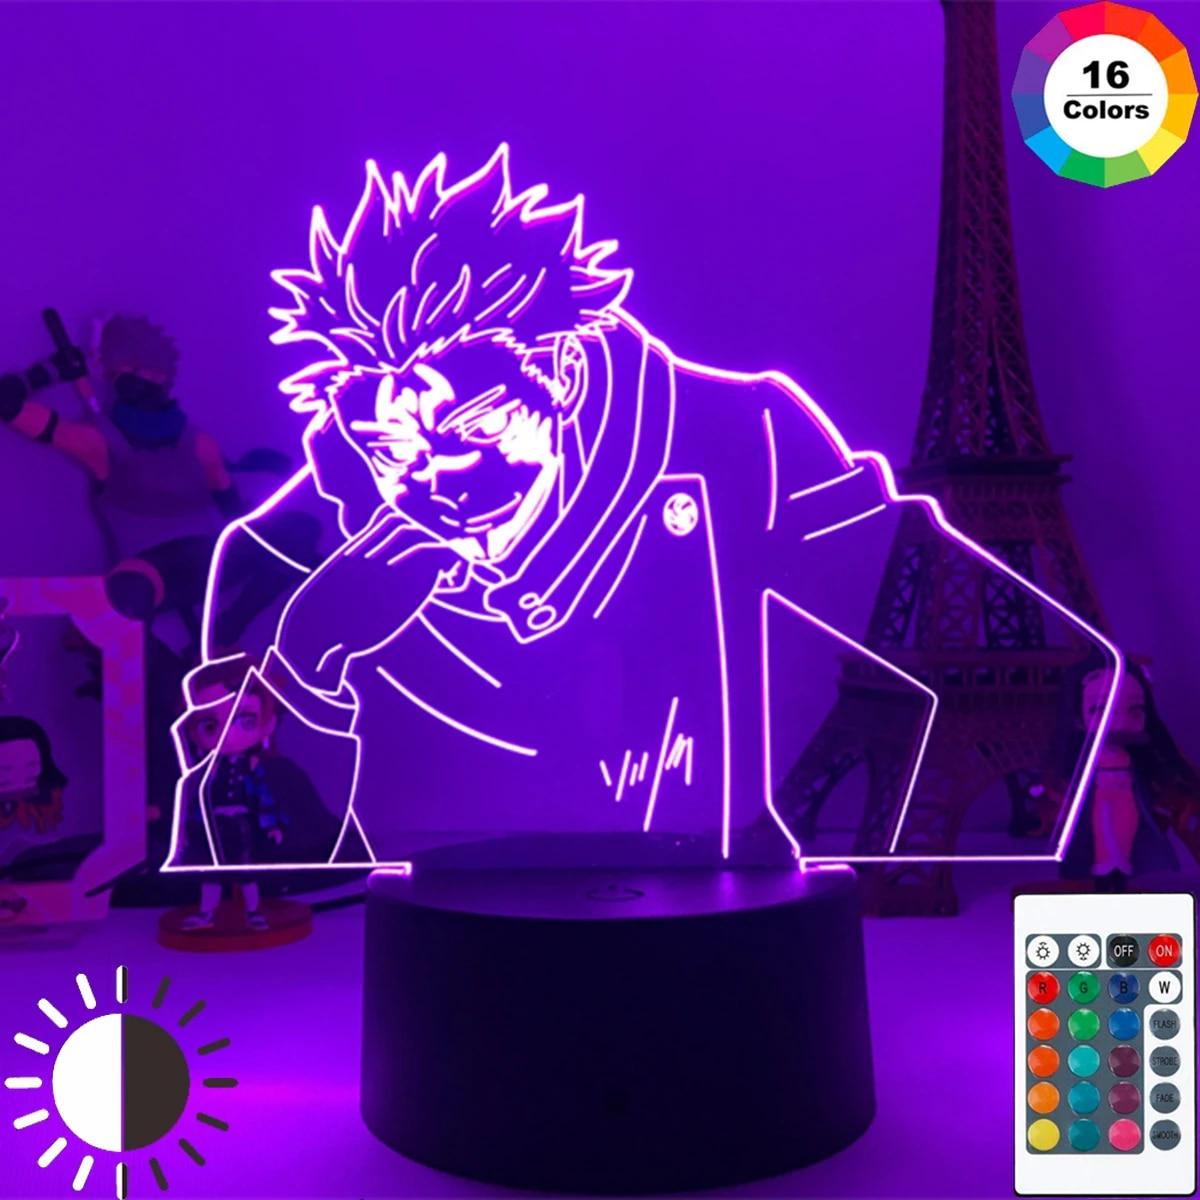 Anime Lamp Ryomen Sukuna Jujutsu Kaisen 3d Led Night Light For Kids Birthday Gift Jujutsu Kaisen Yuji Itadori Lamp Drop Shipping Led Night Lights Aliexpress